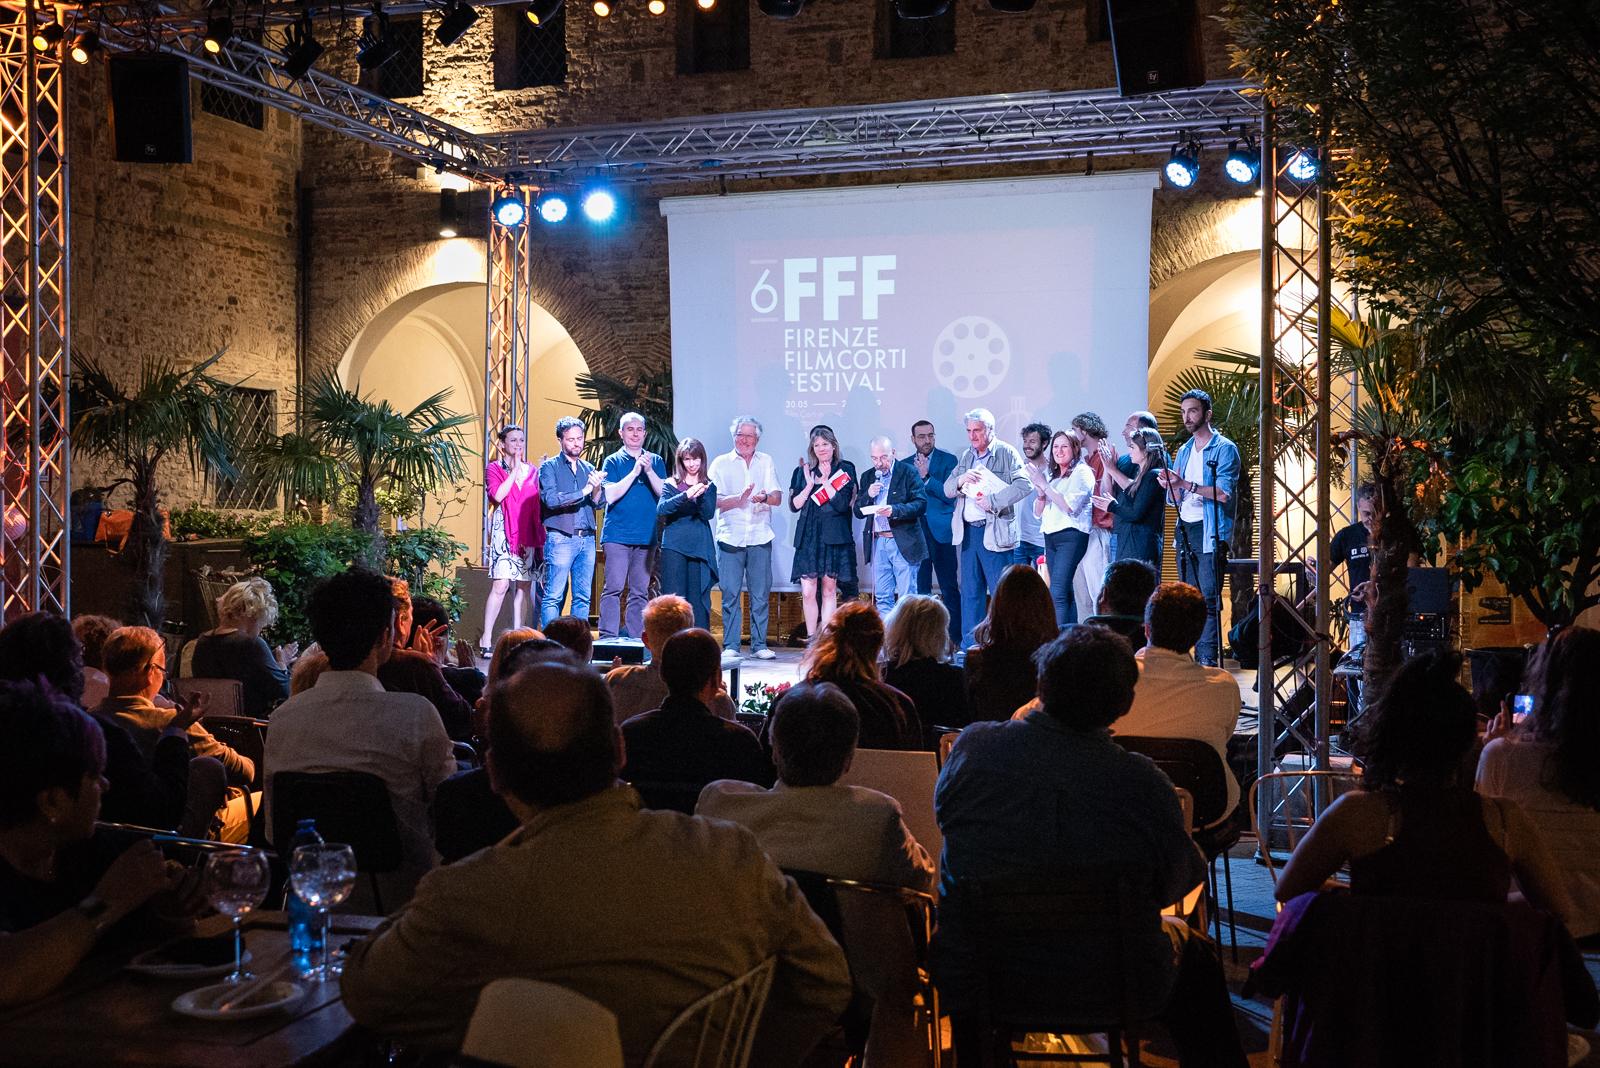 2019-06-02 - Rive Gauche - 2019 Firenze FilmCorti Festival-106.jpg